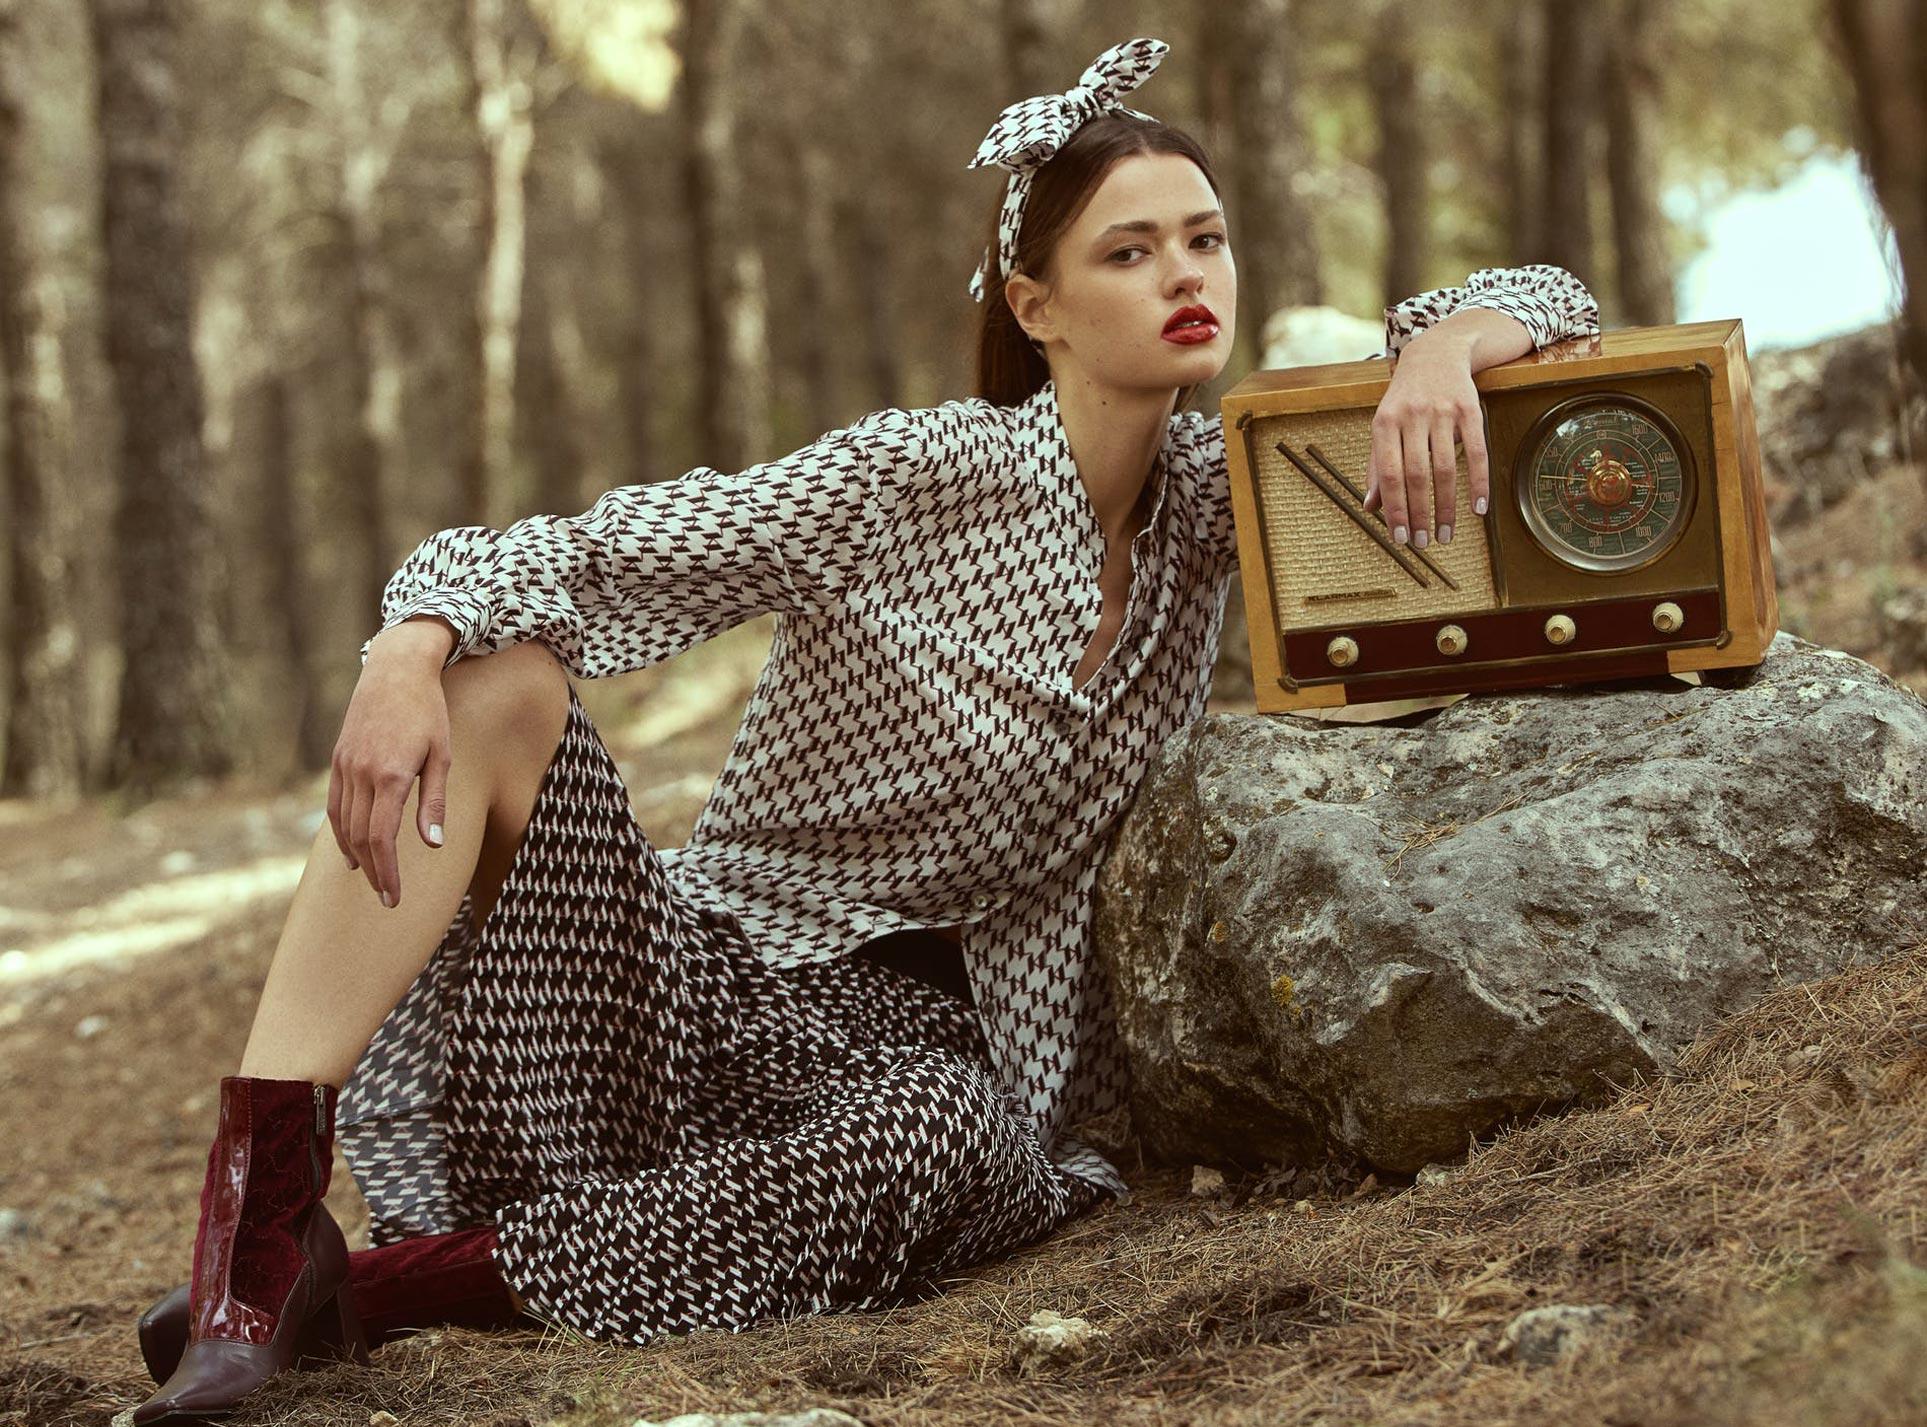 Диана Свиридова в лесу демонстрирует винтажную технику и новинки моды / фото 01